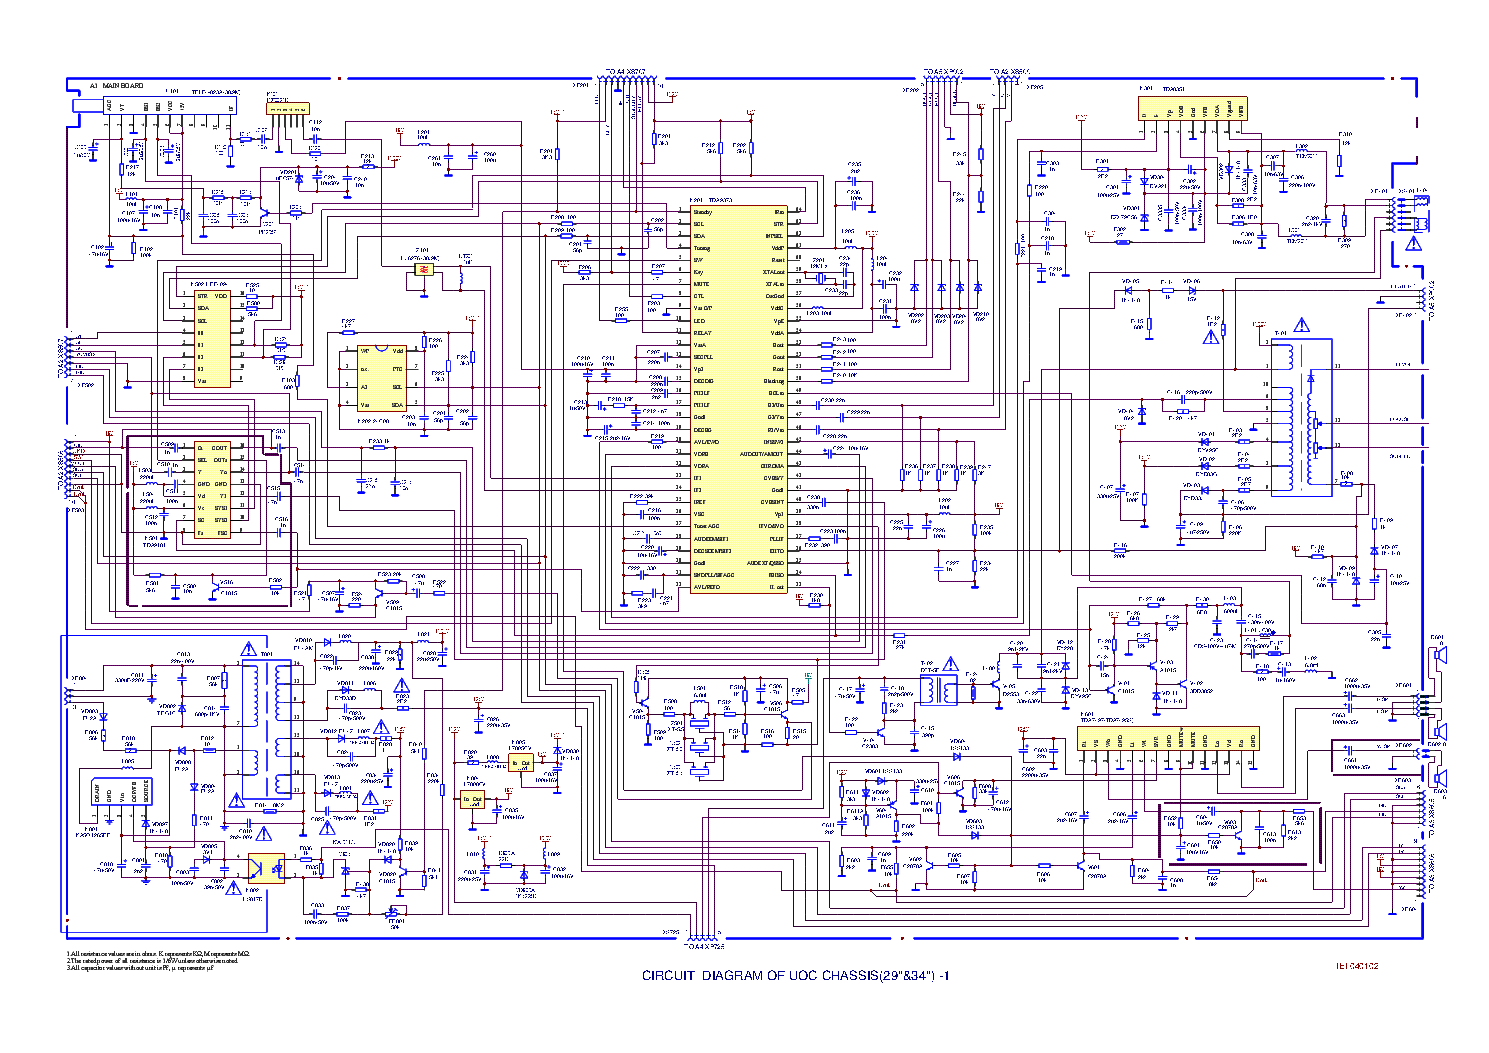 la76931 circuit diagram la76931 image wiring diagram hisense usoc la76931 sm service manual schematics on la76931 circuit diagram